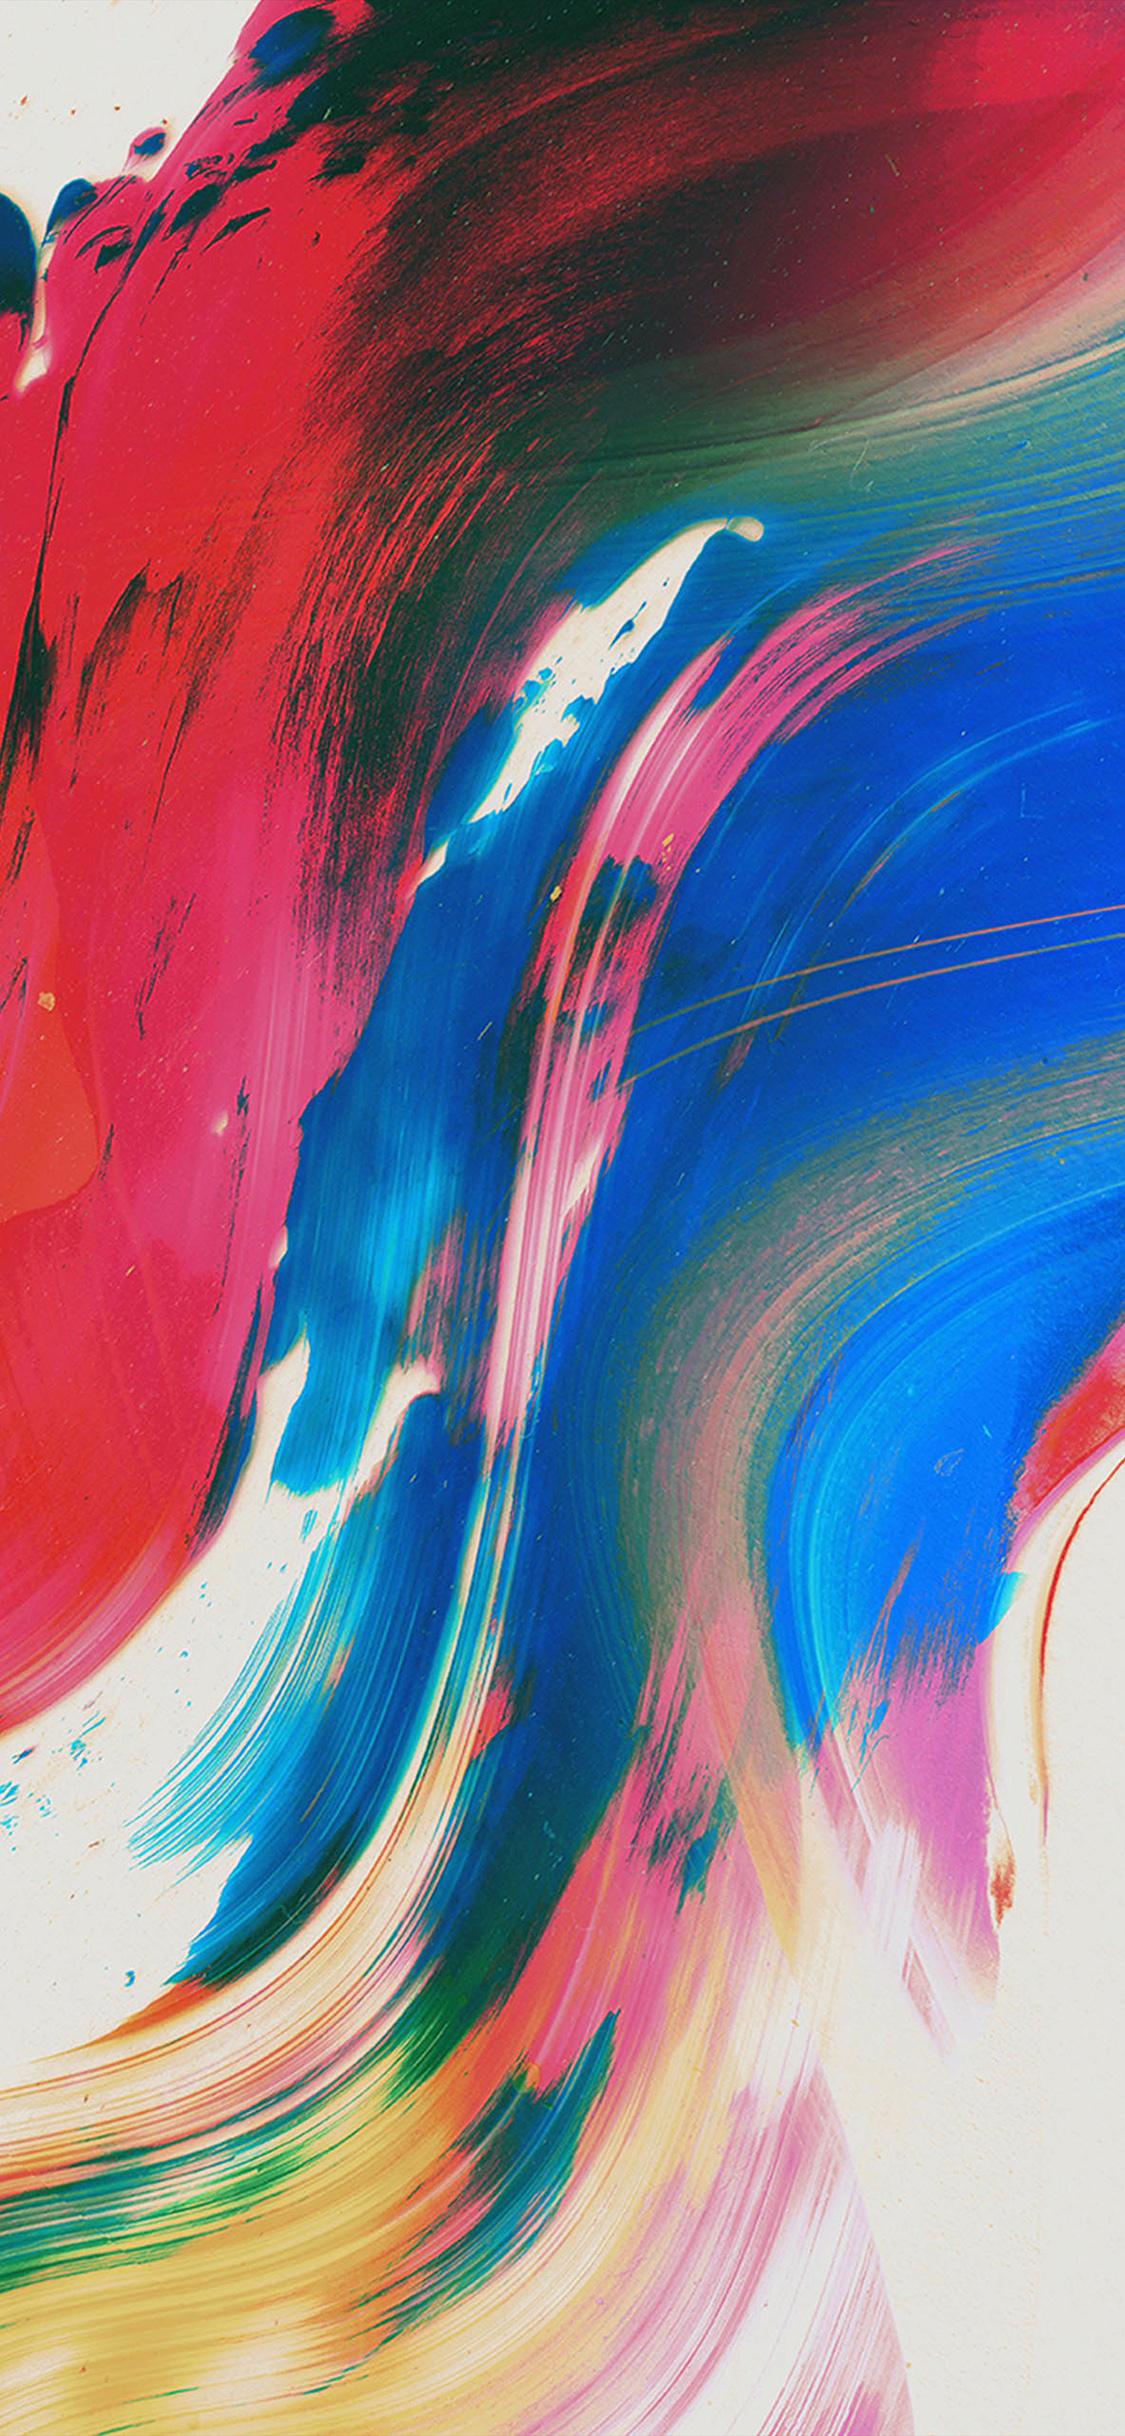 Iphone11papers Com Iphone11 Wallpaper Vu35 Paint Texture Art Pattern Color Blue